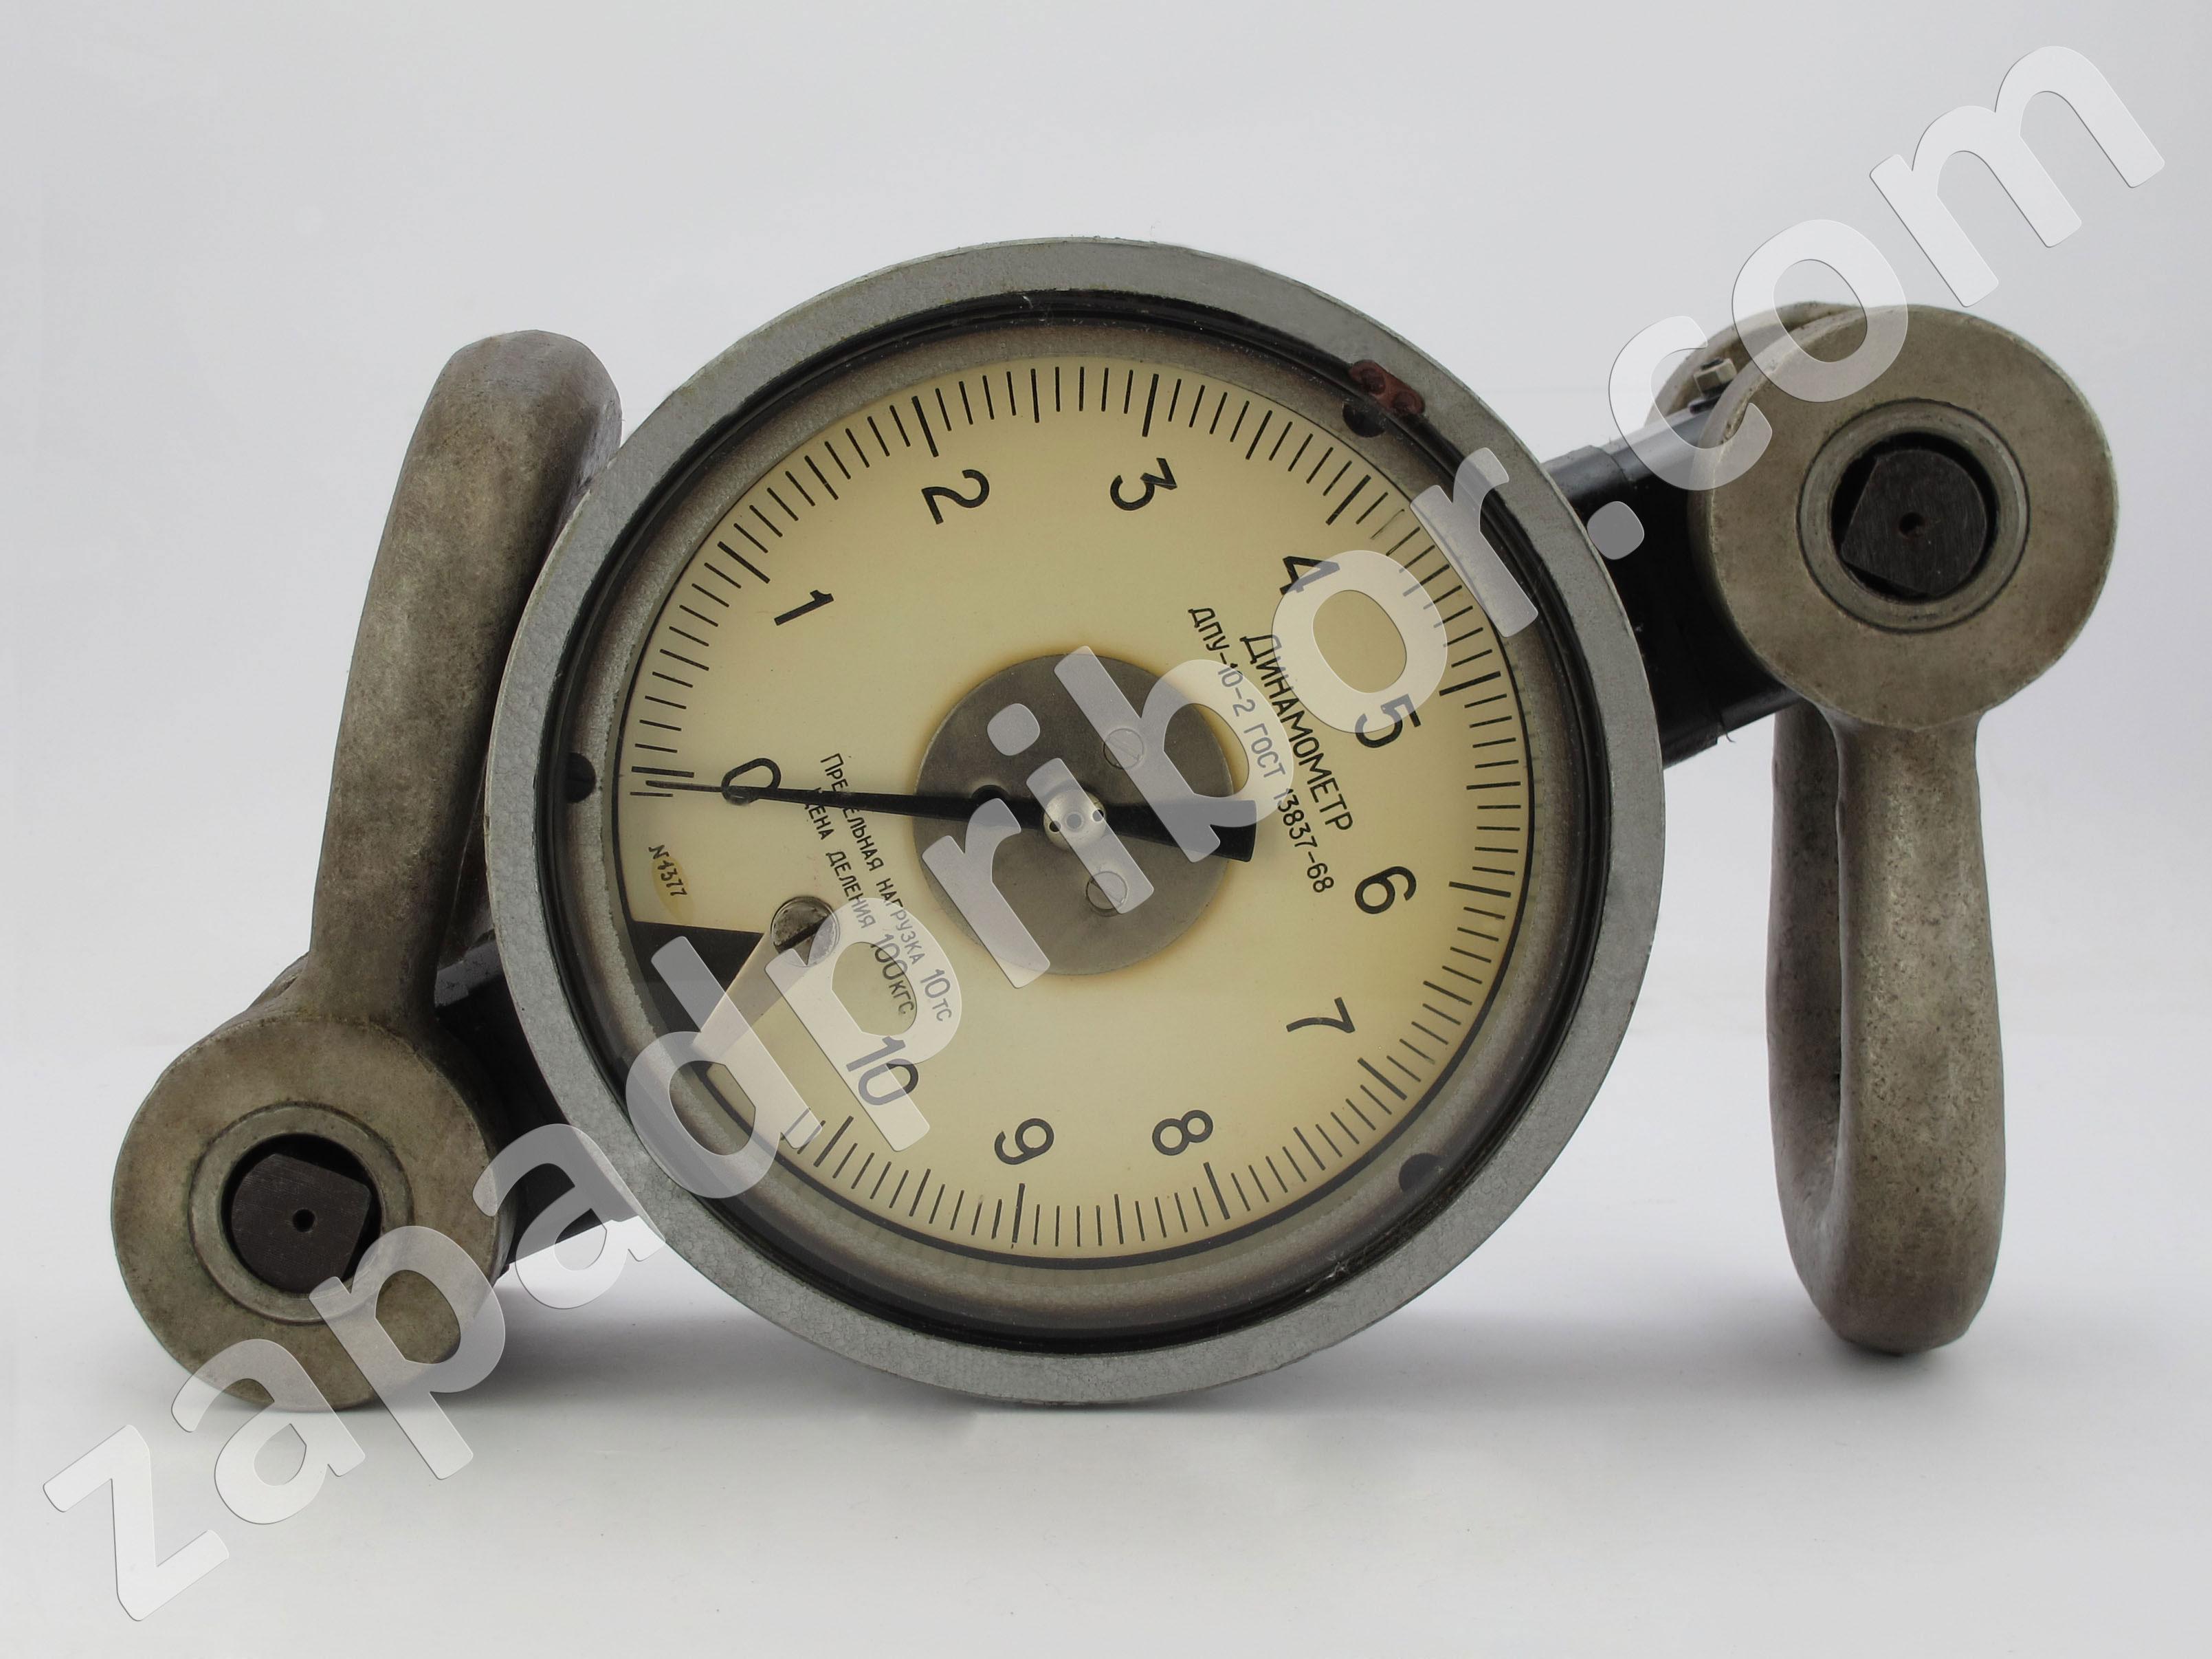 инструкция по эксплуатации динамометр дпу-5-2